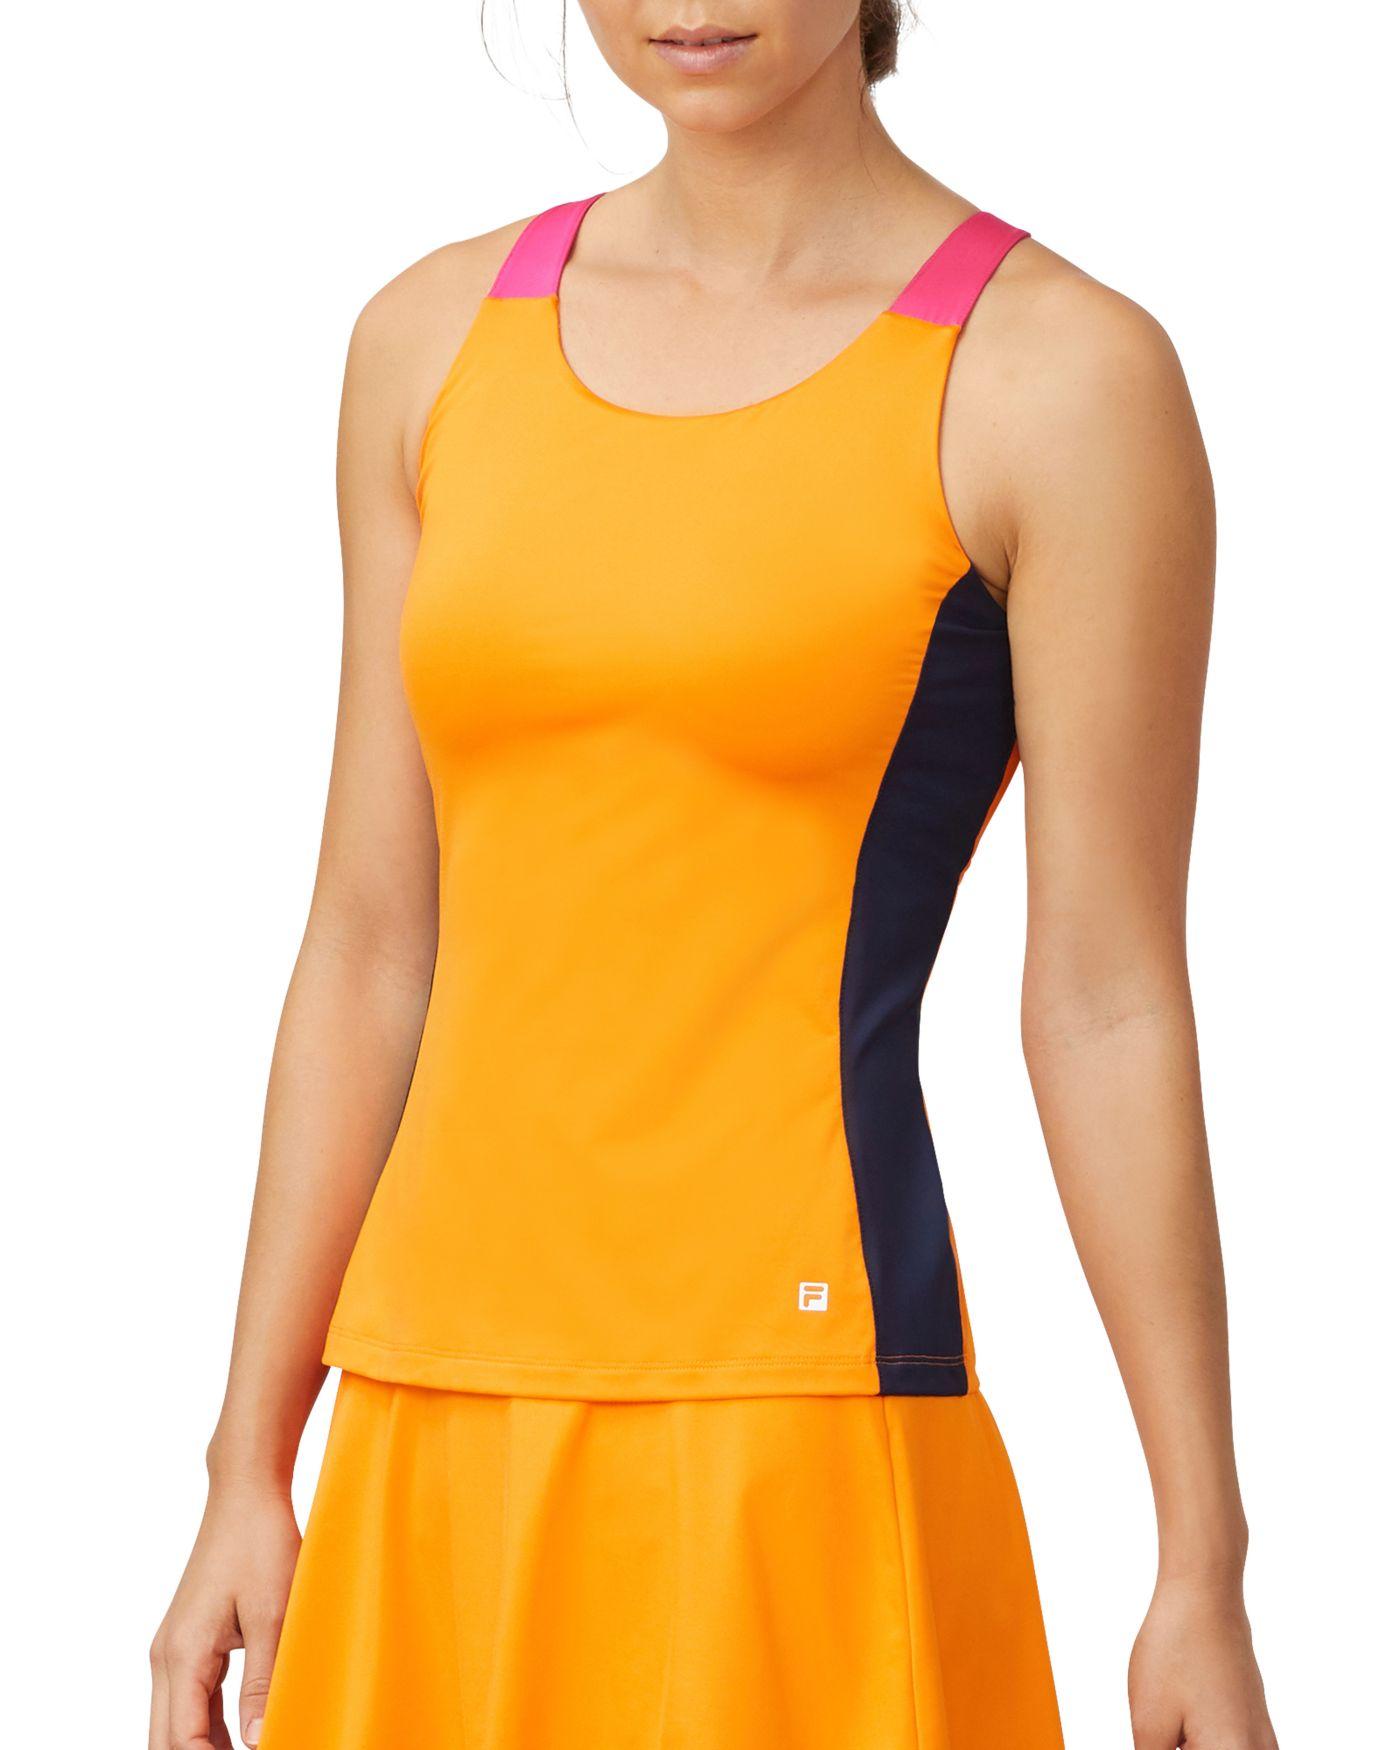 Fila Women's Awning Color Blocked Tennis Tank